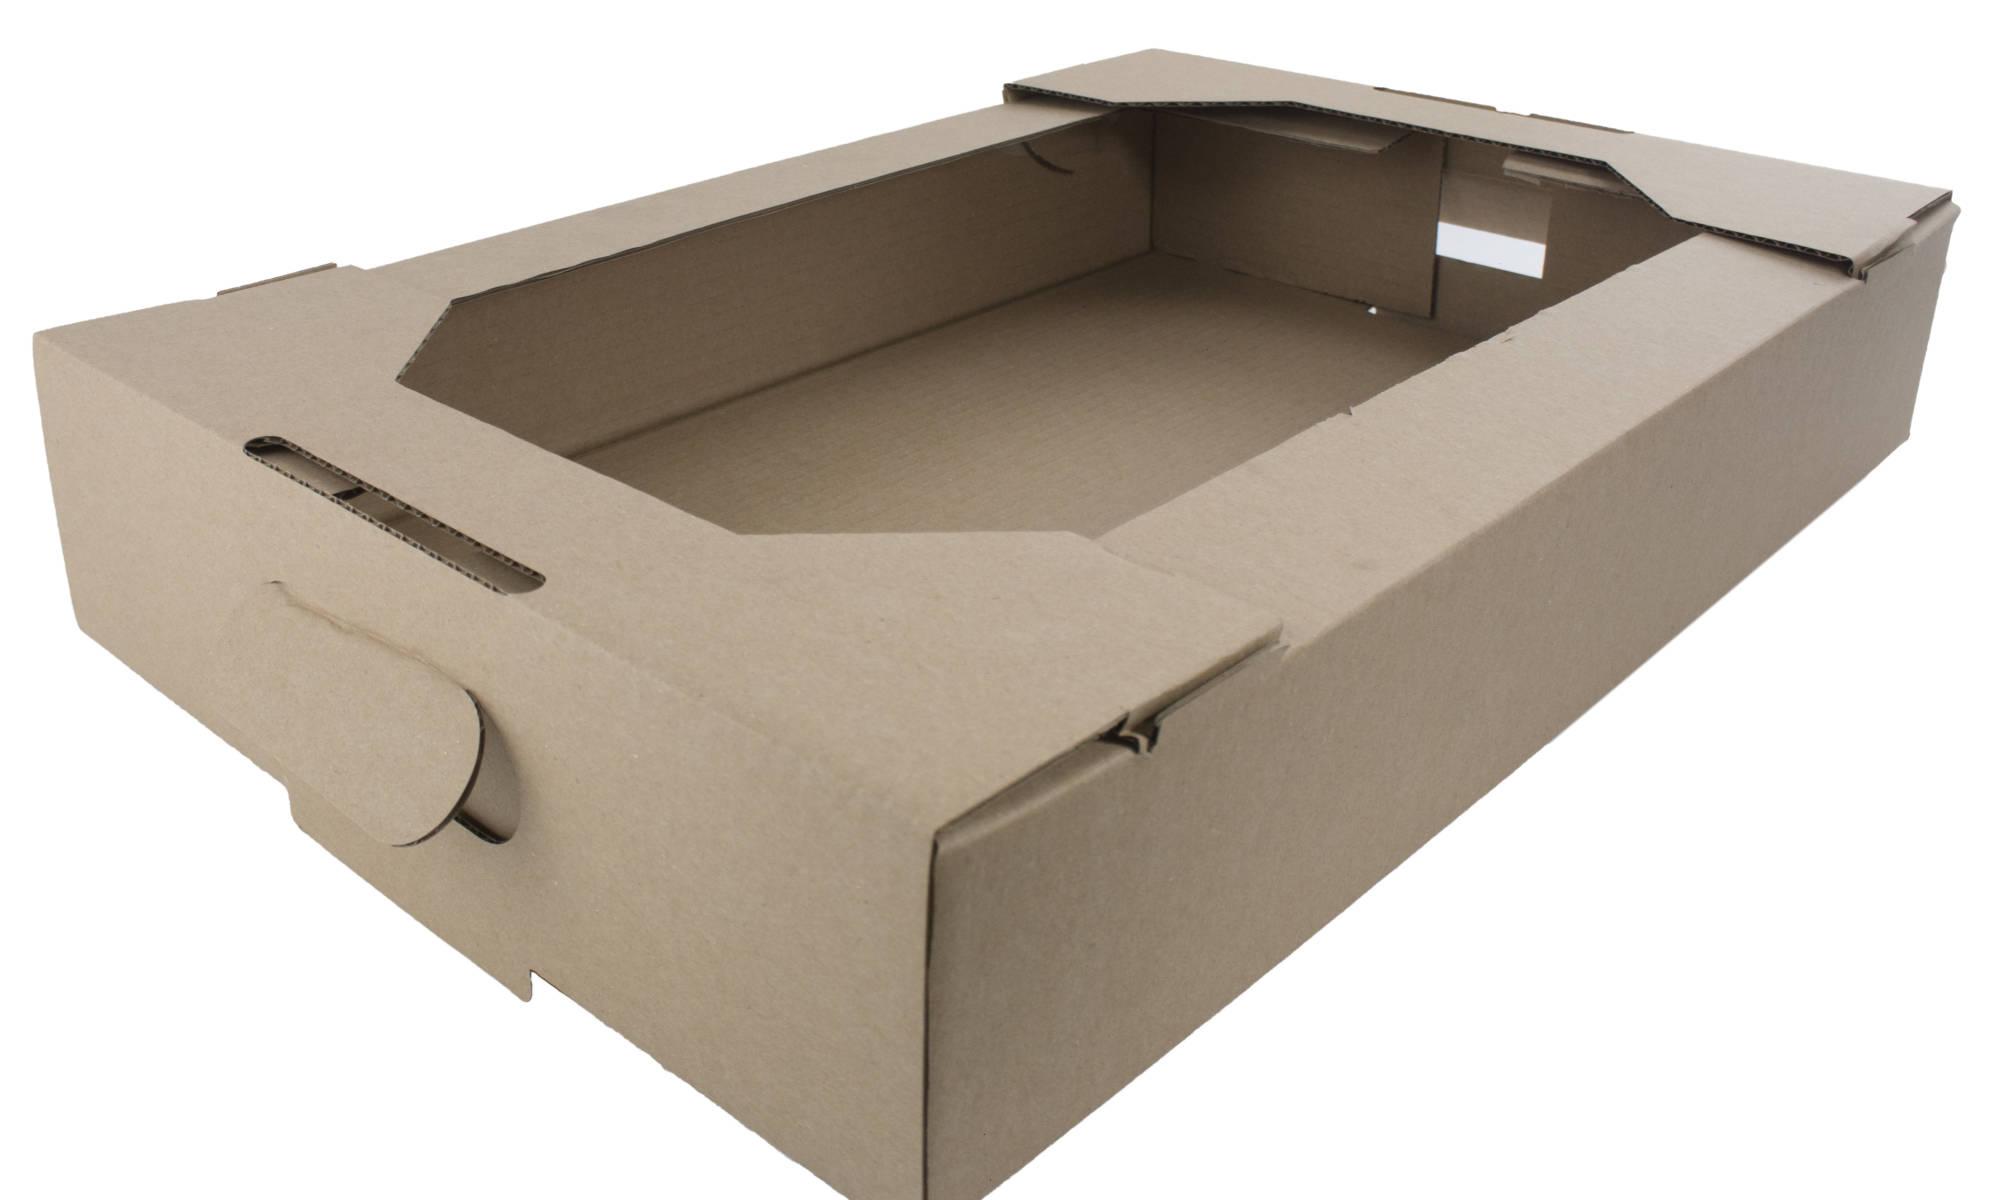 eco-friendly cardboard bakery tray